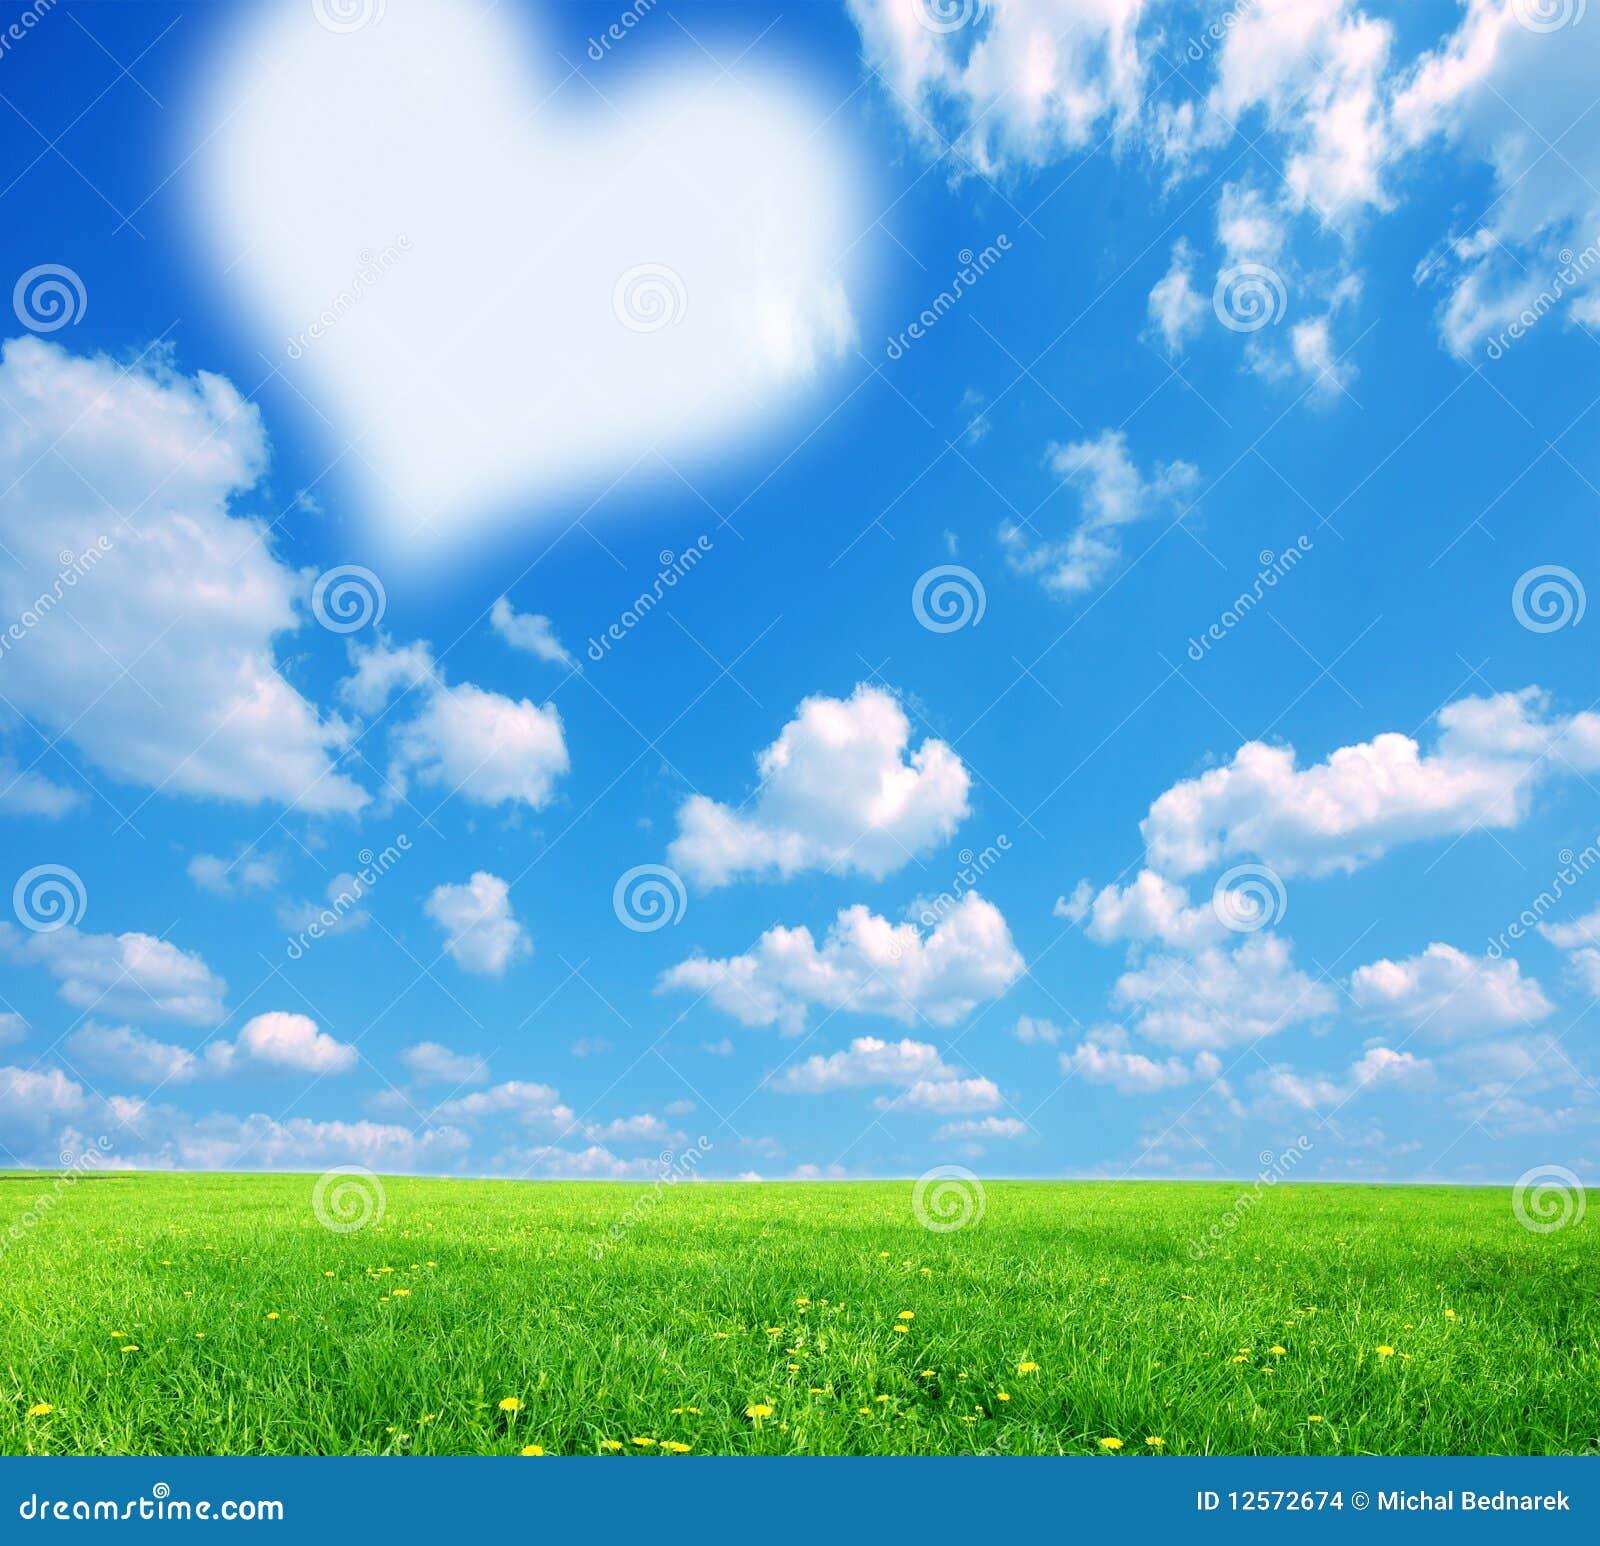 Beautiful Nature Video Download: Love Nature Background Stock Photo. Image Of Beautiful